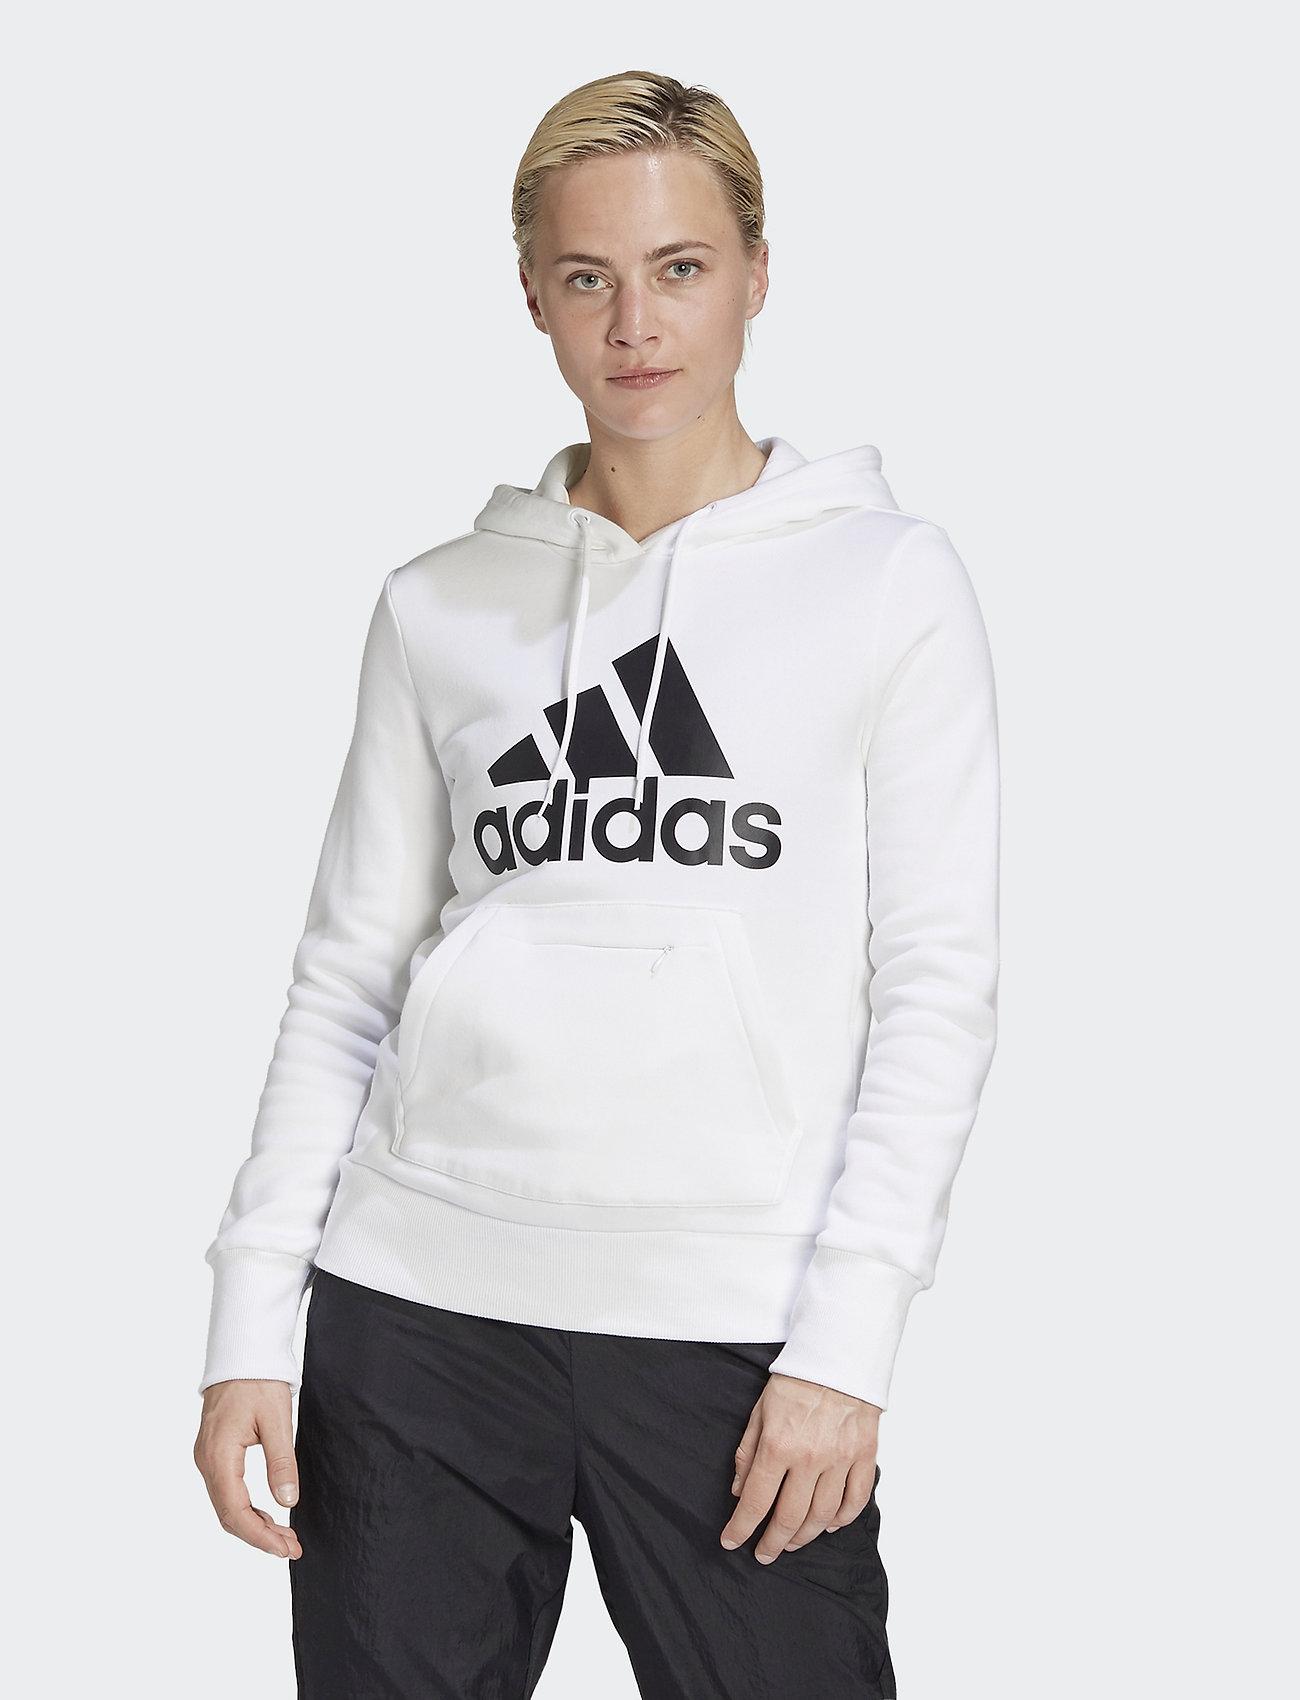 adidas Performance - W BOS OH HD - hupparit - white - 0